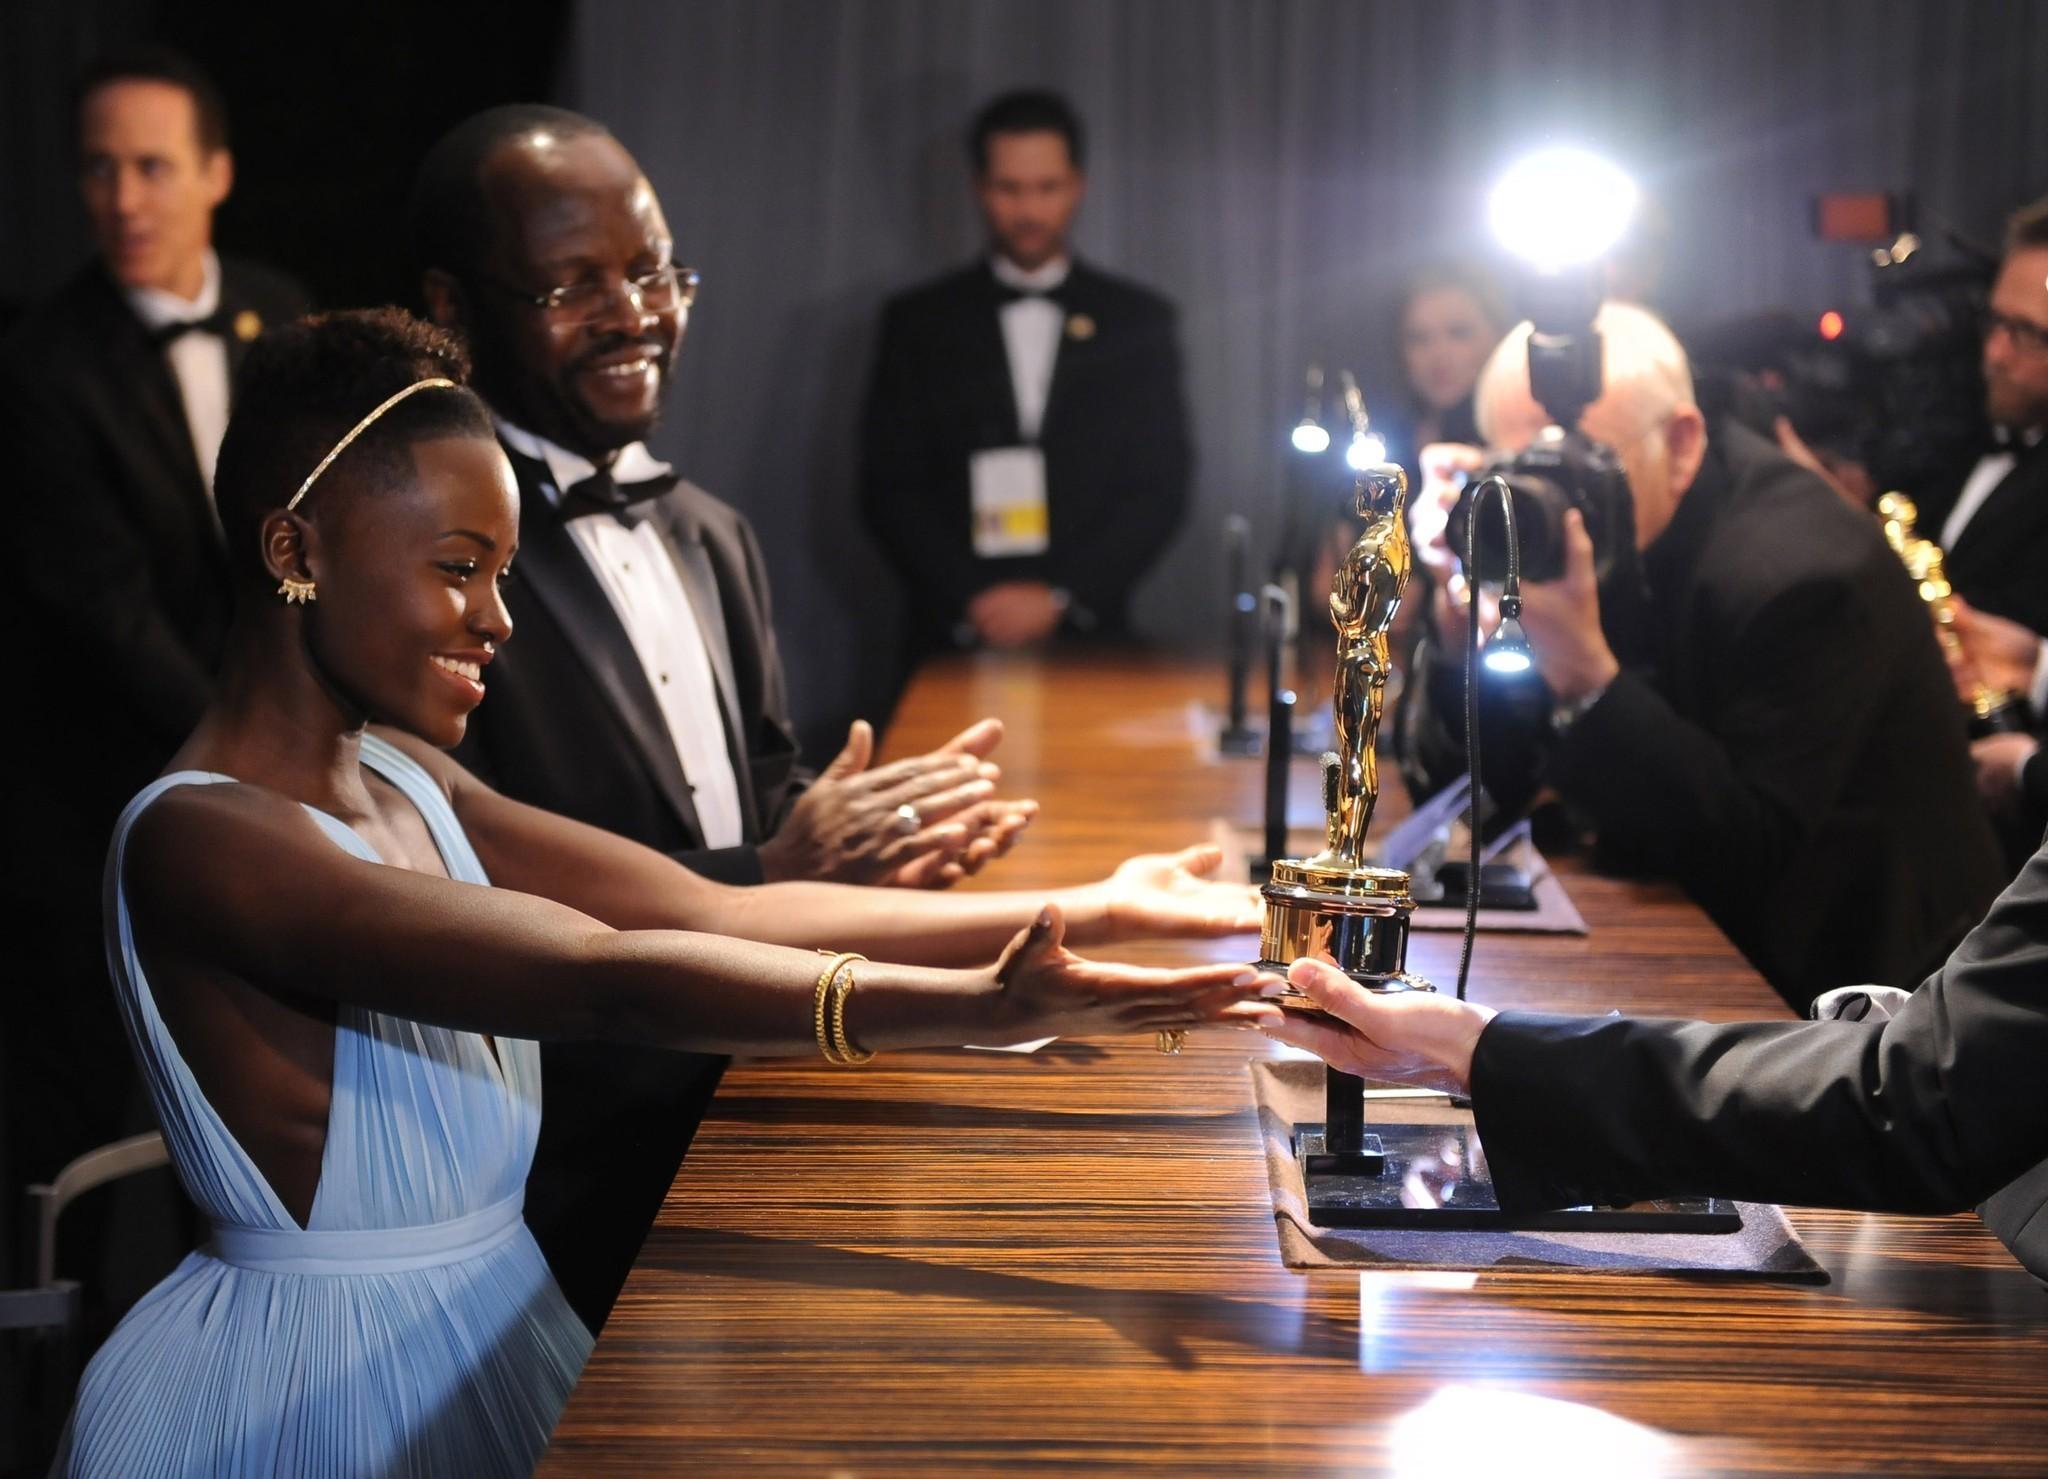 Oscars 2014: Academy Awards' Governors Ball - Capital Gazette